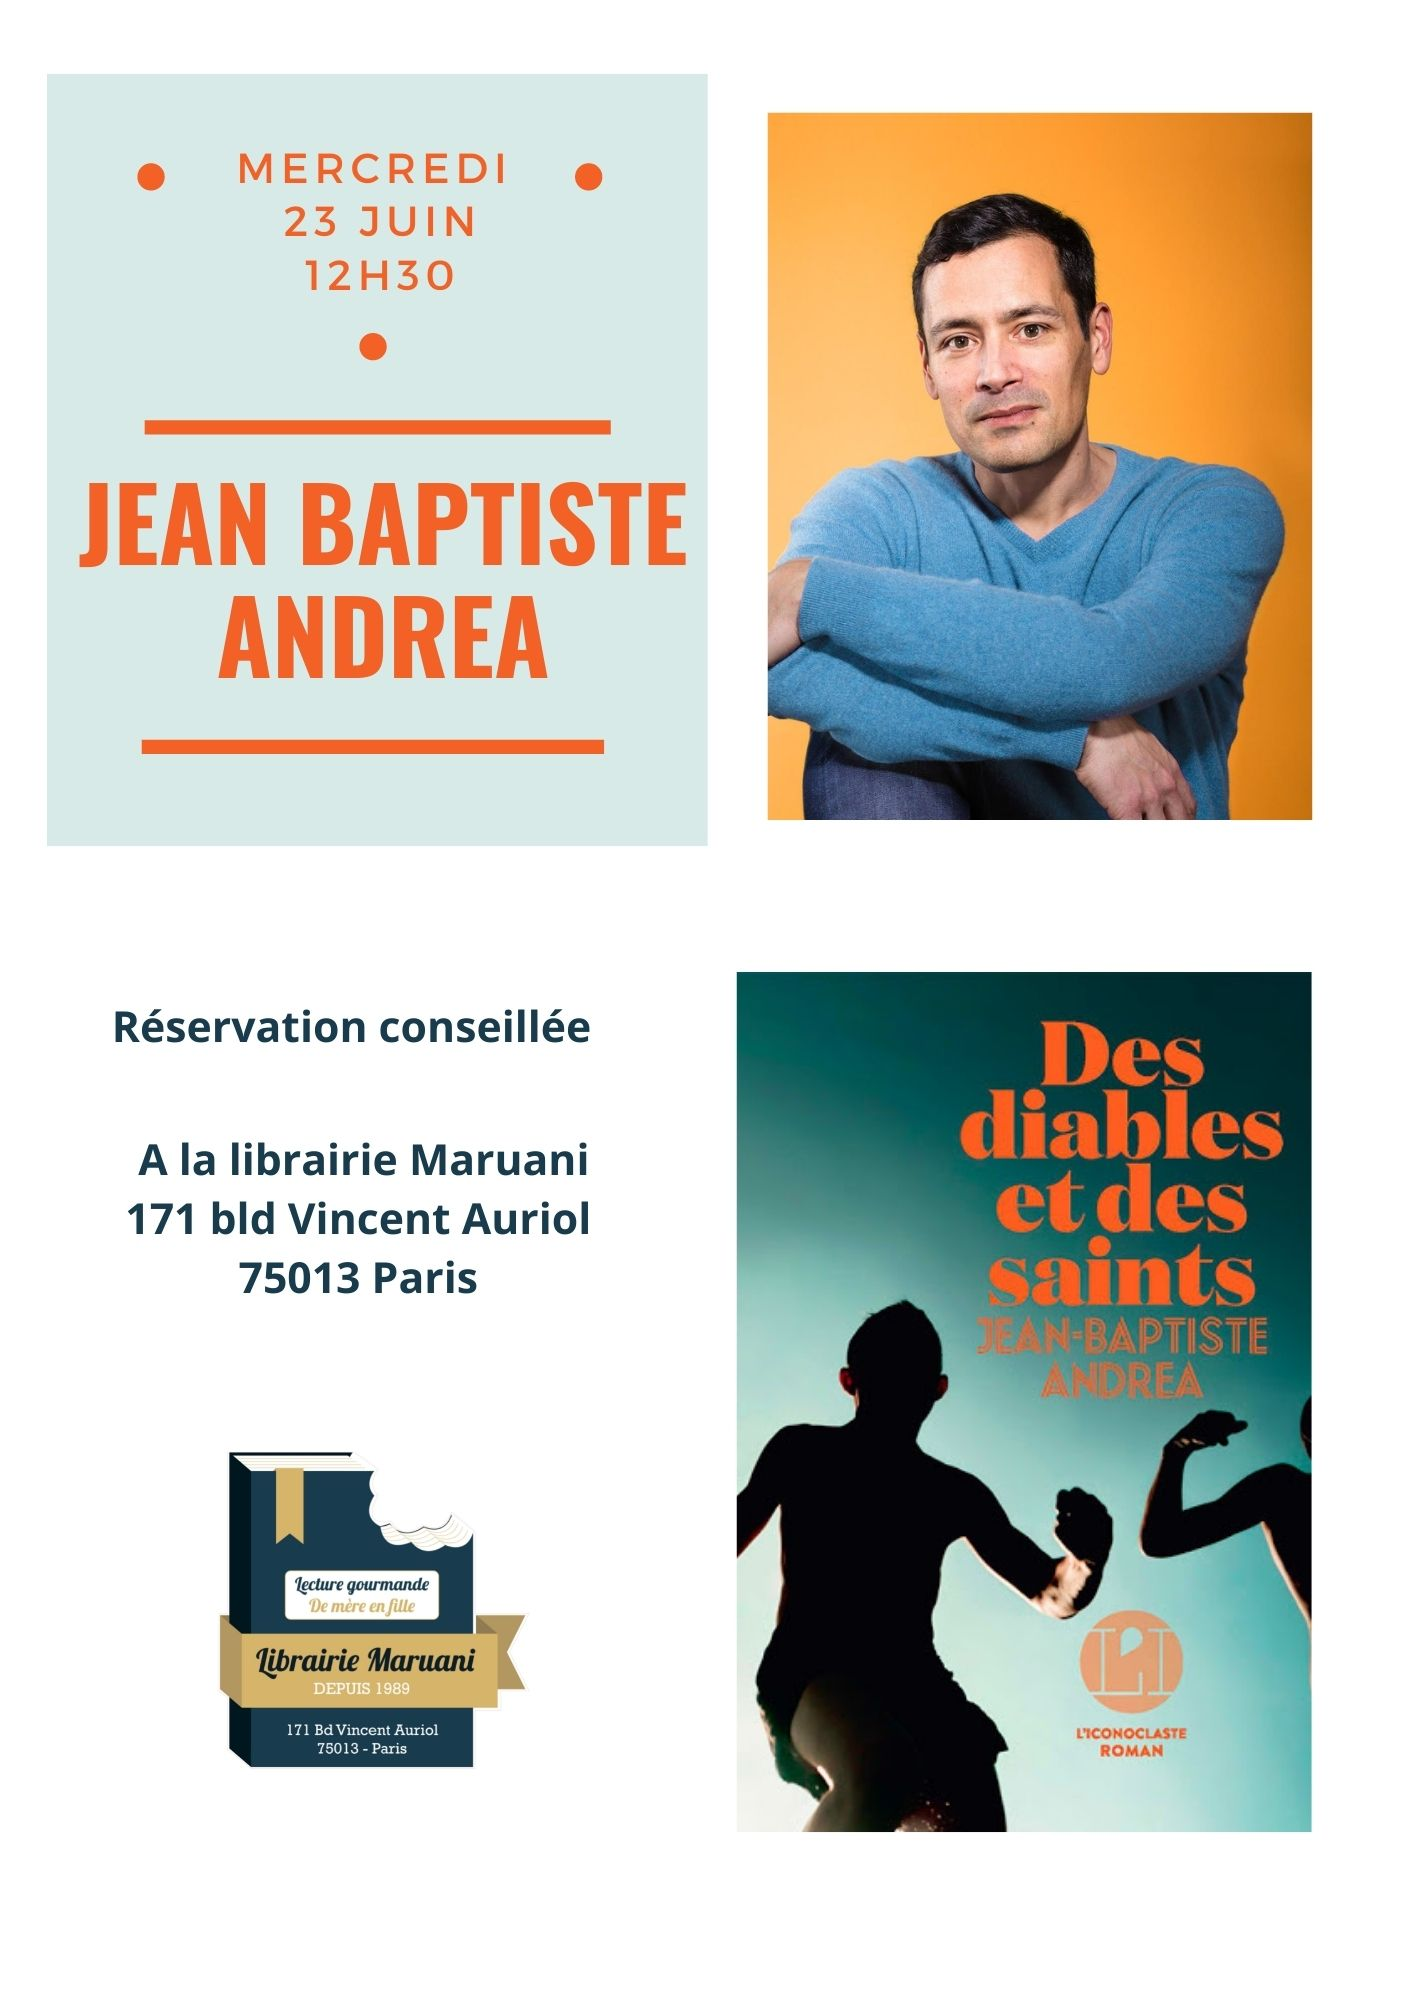 Rencontre Jean-Baptiste Andréa